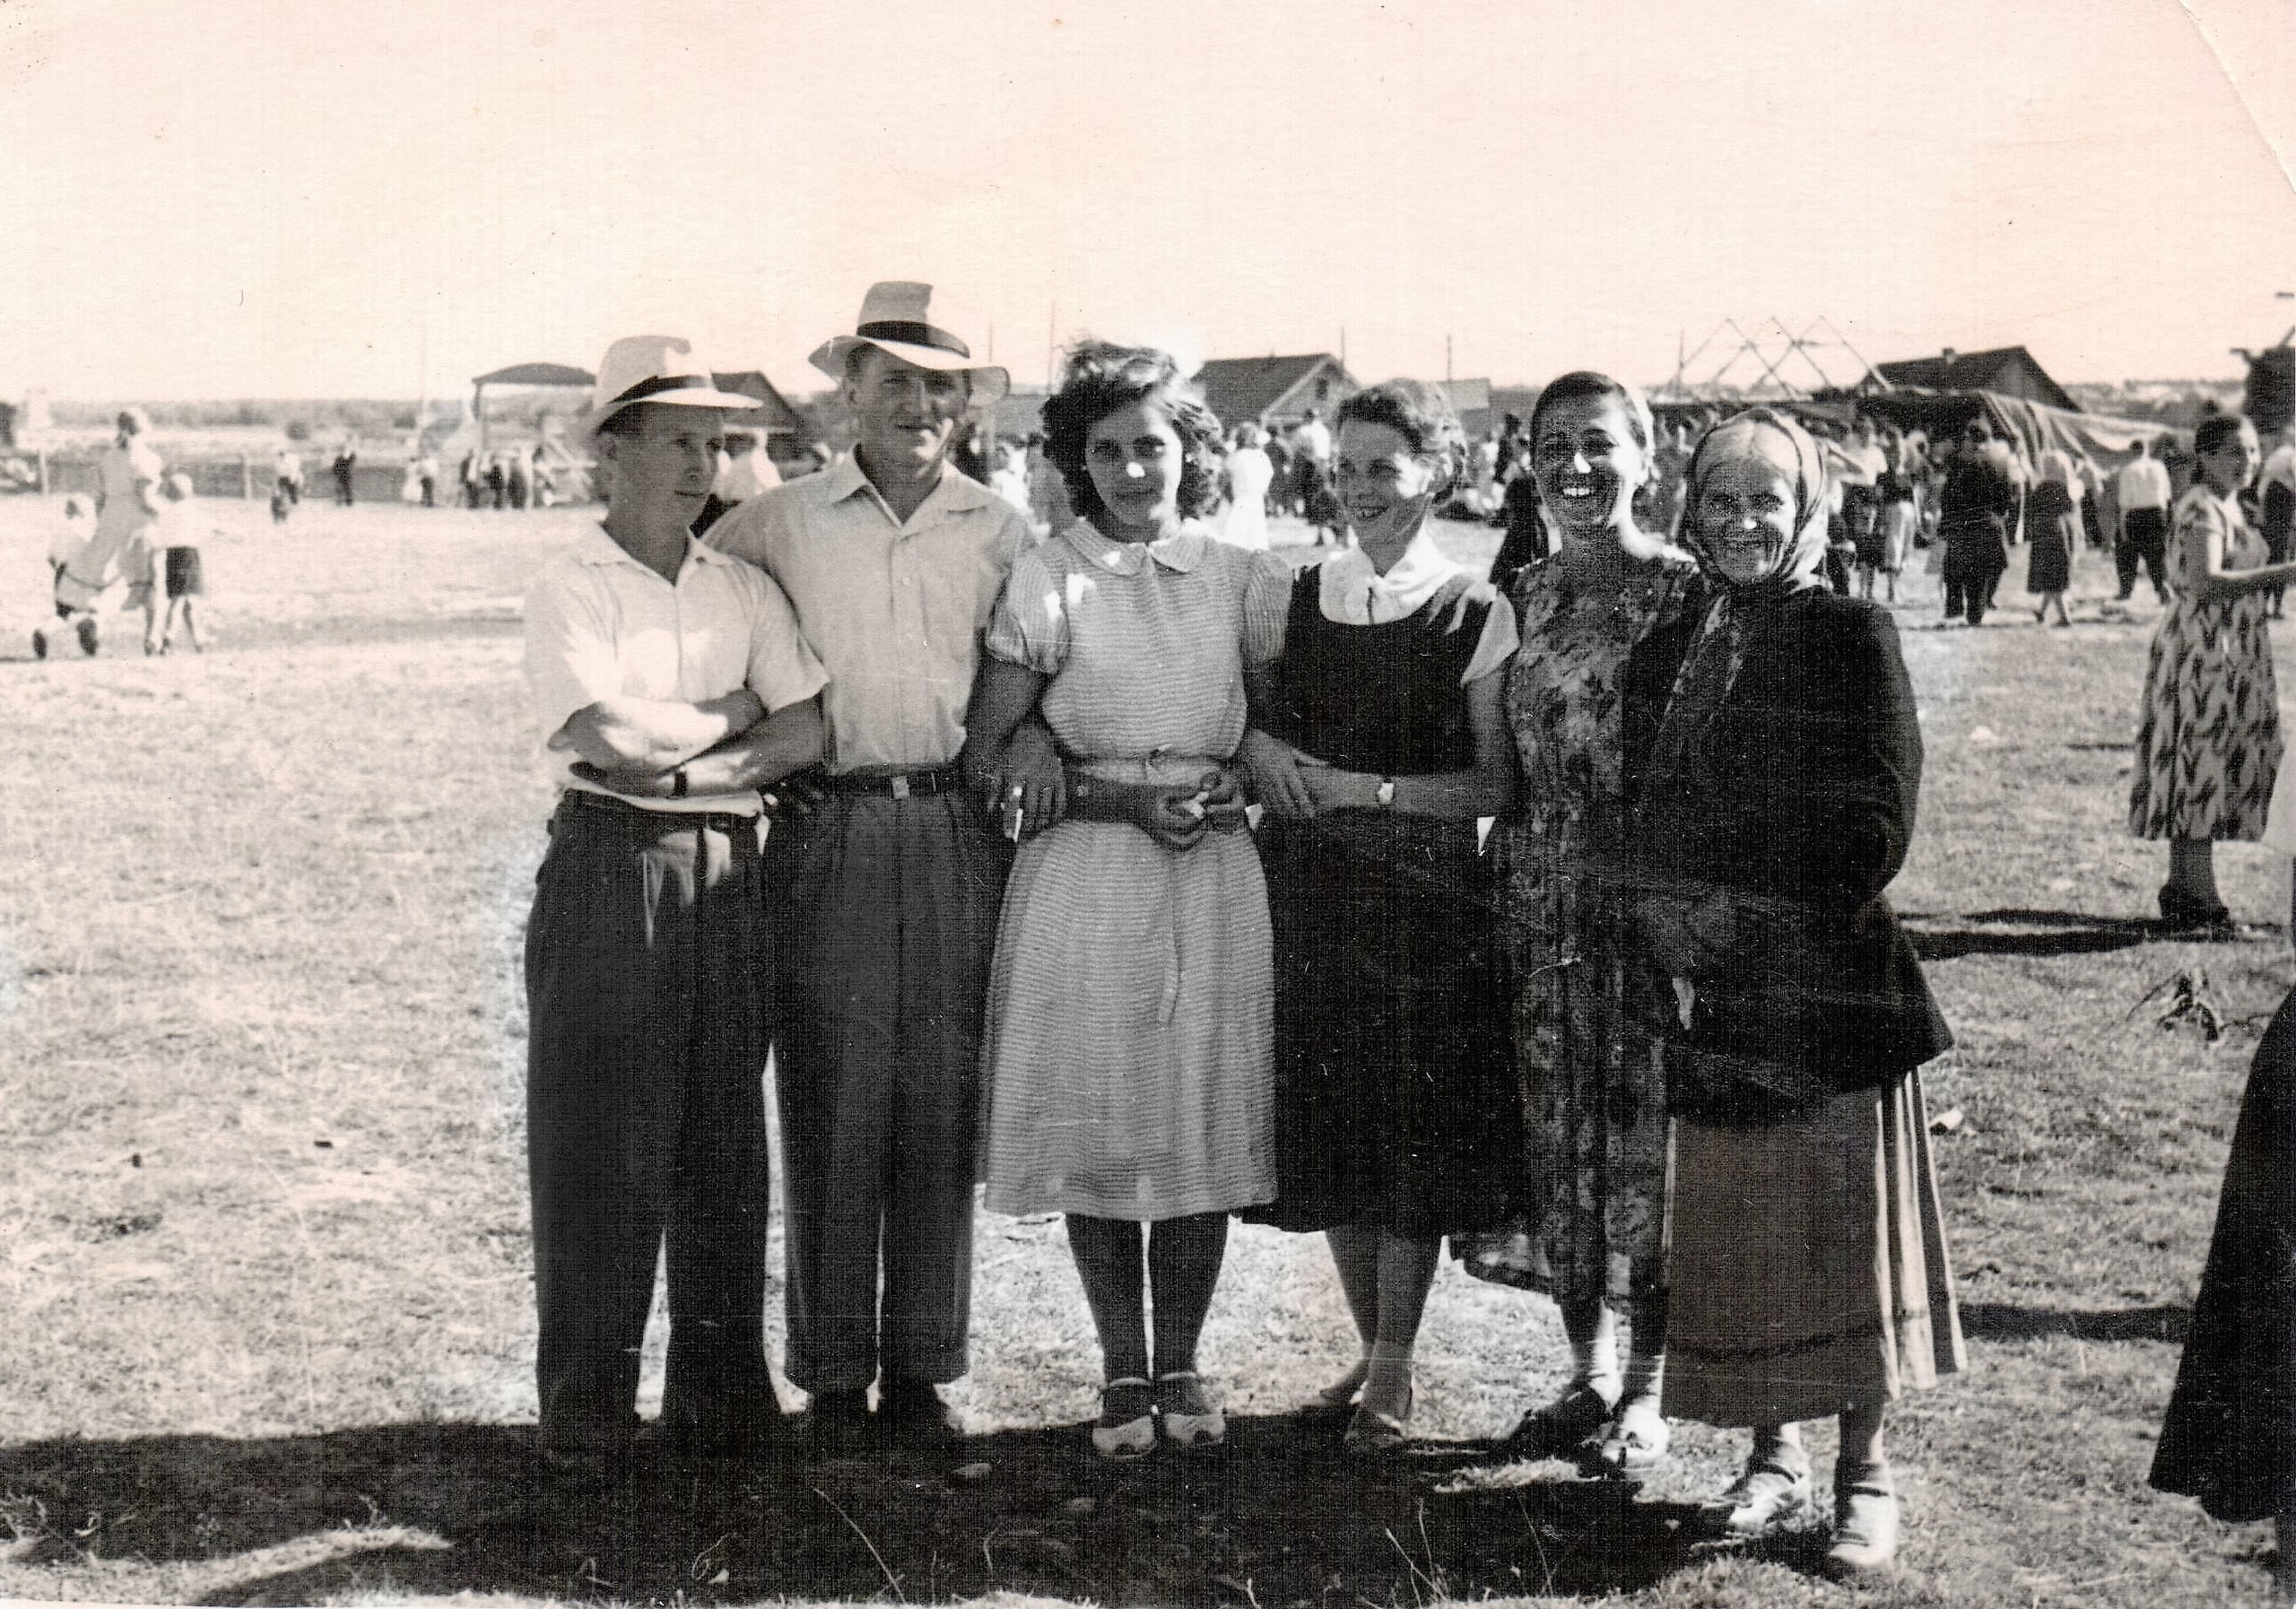 Август 1957-го года, День железнодорожника на стадионе